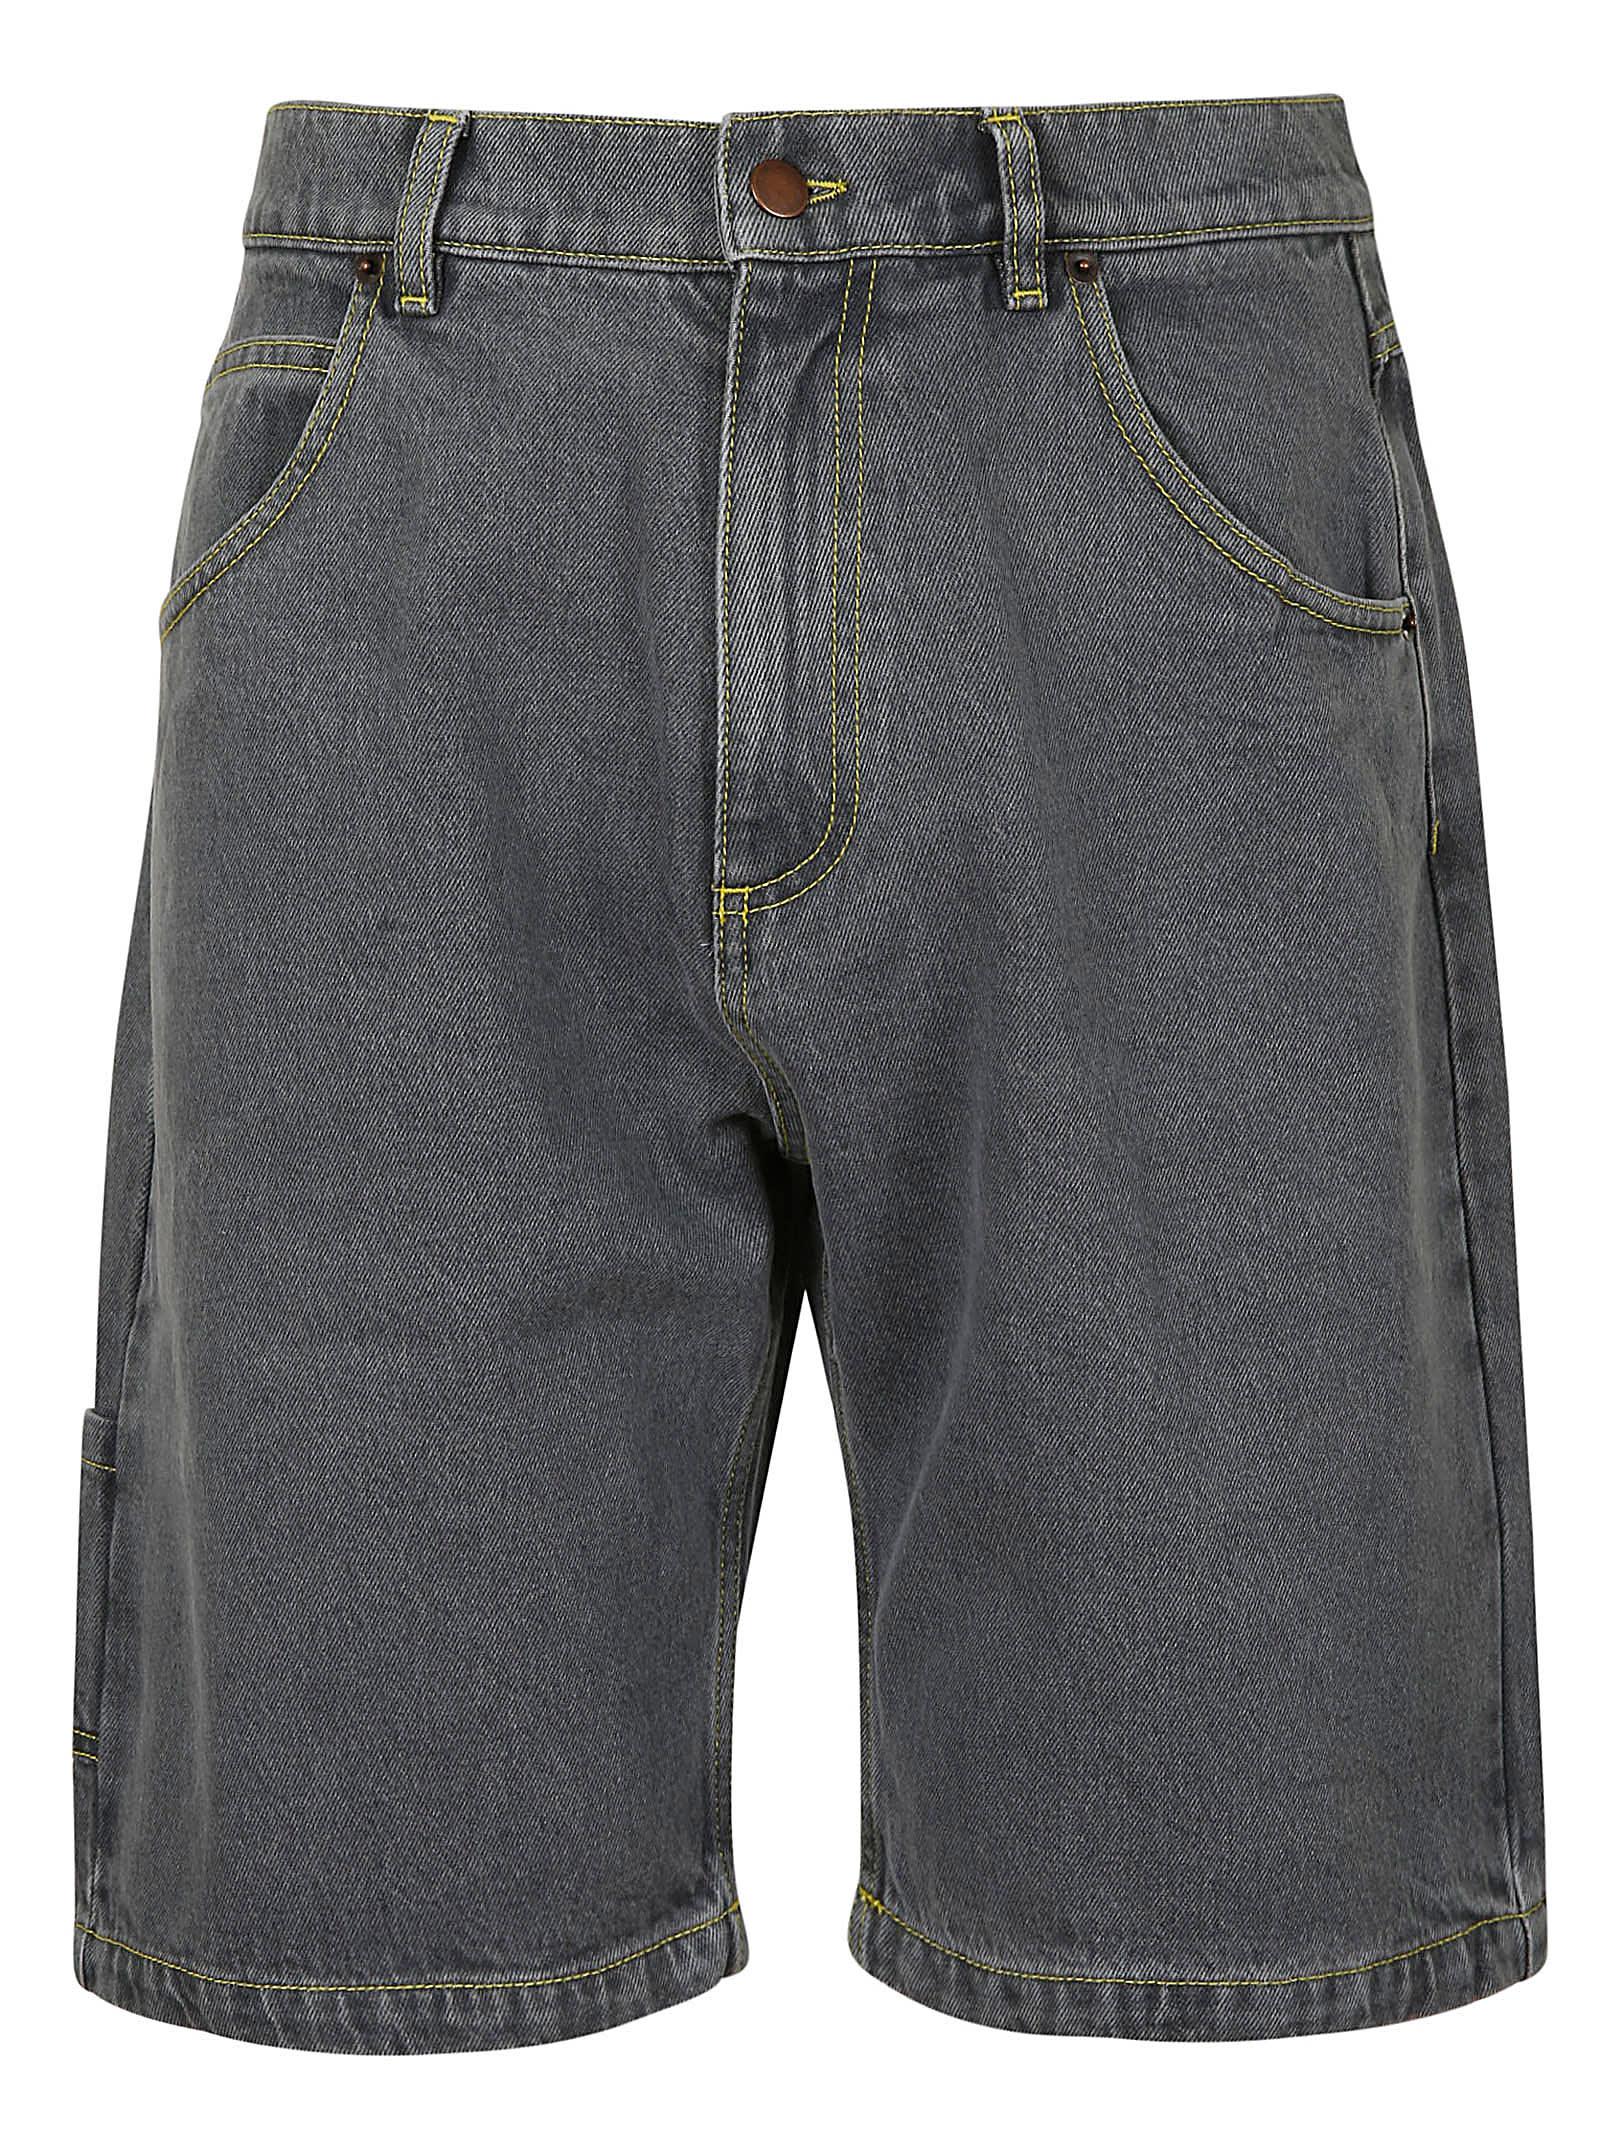 PACCBET Denim Baggy Short Pants